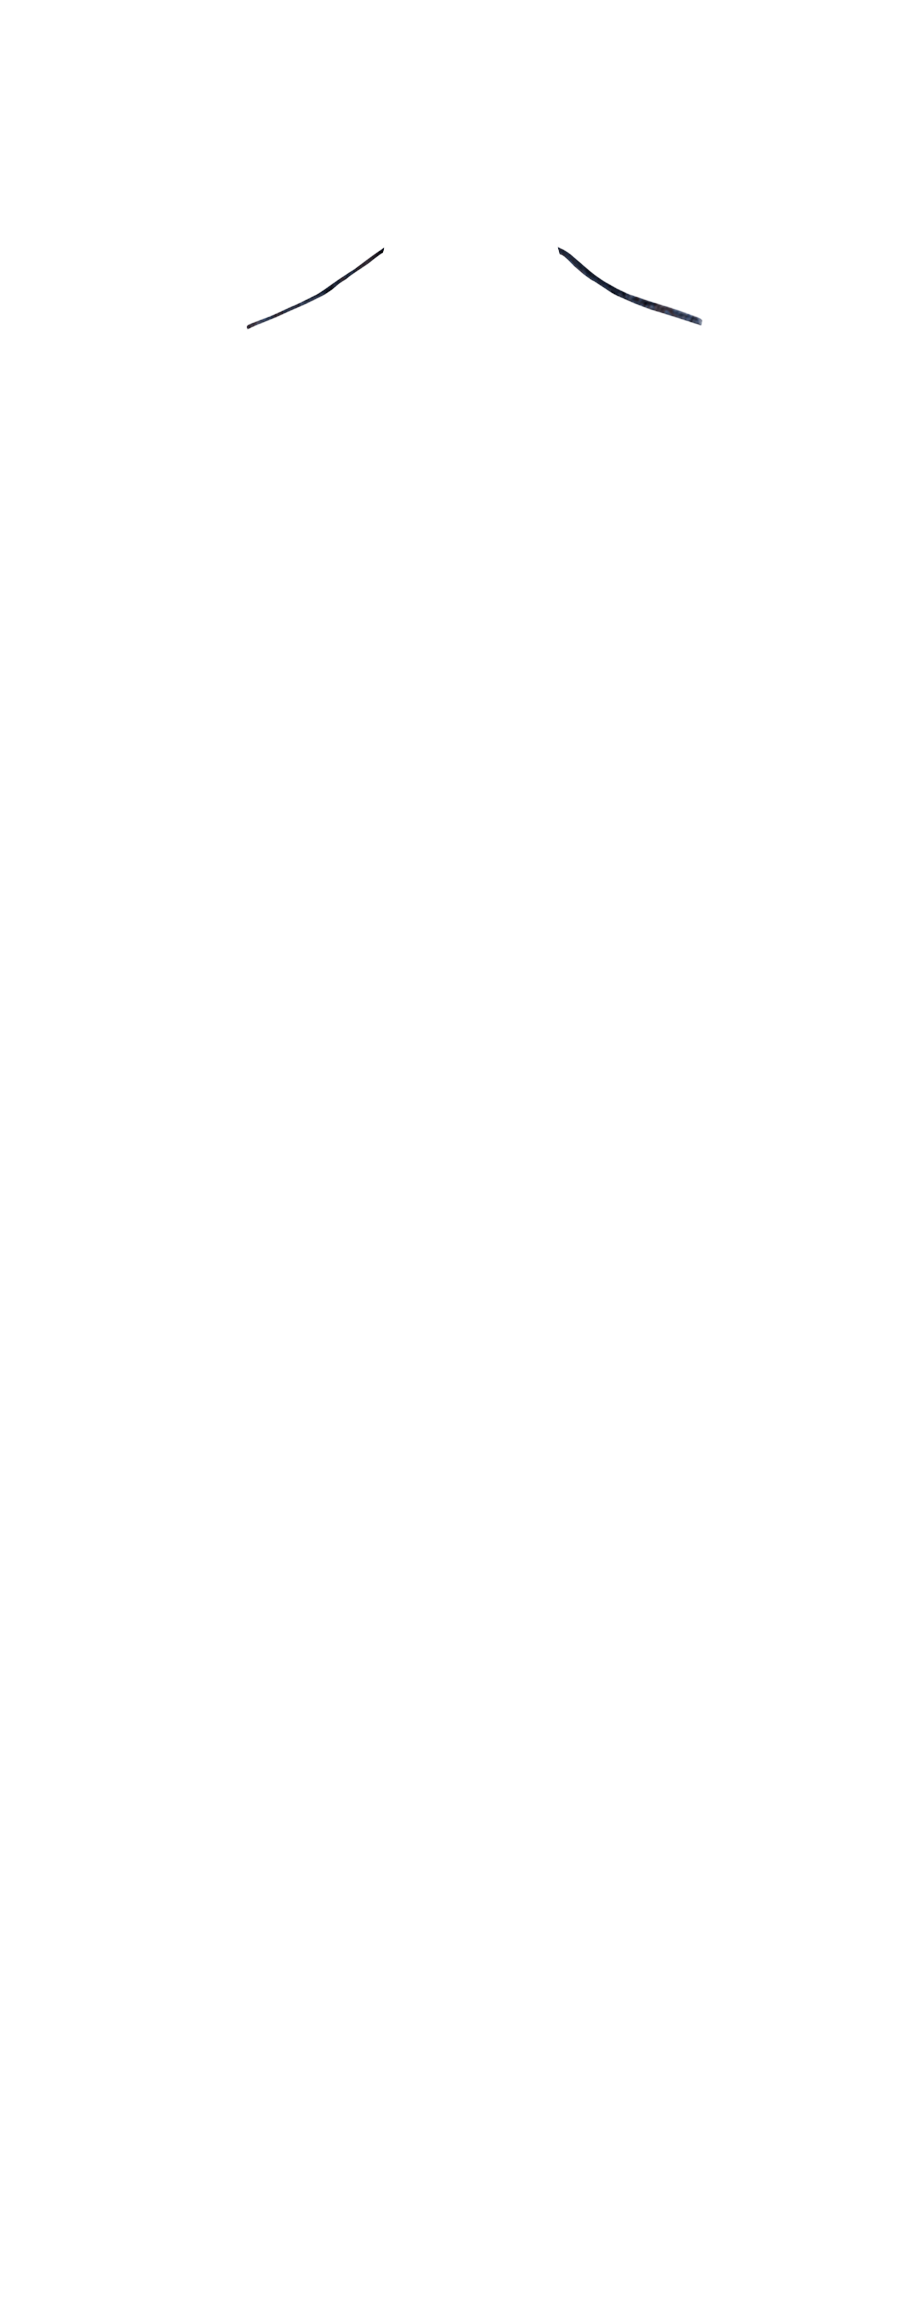 NEFL-21